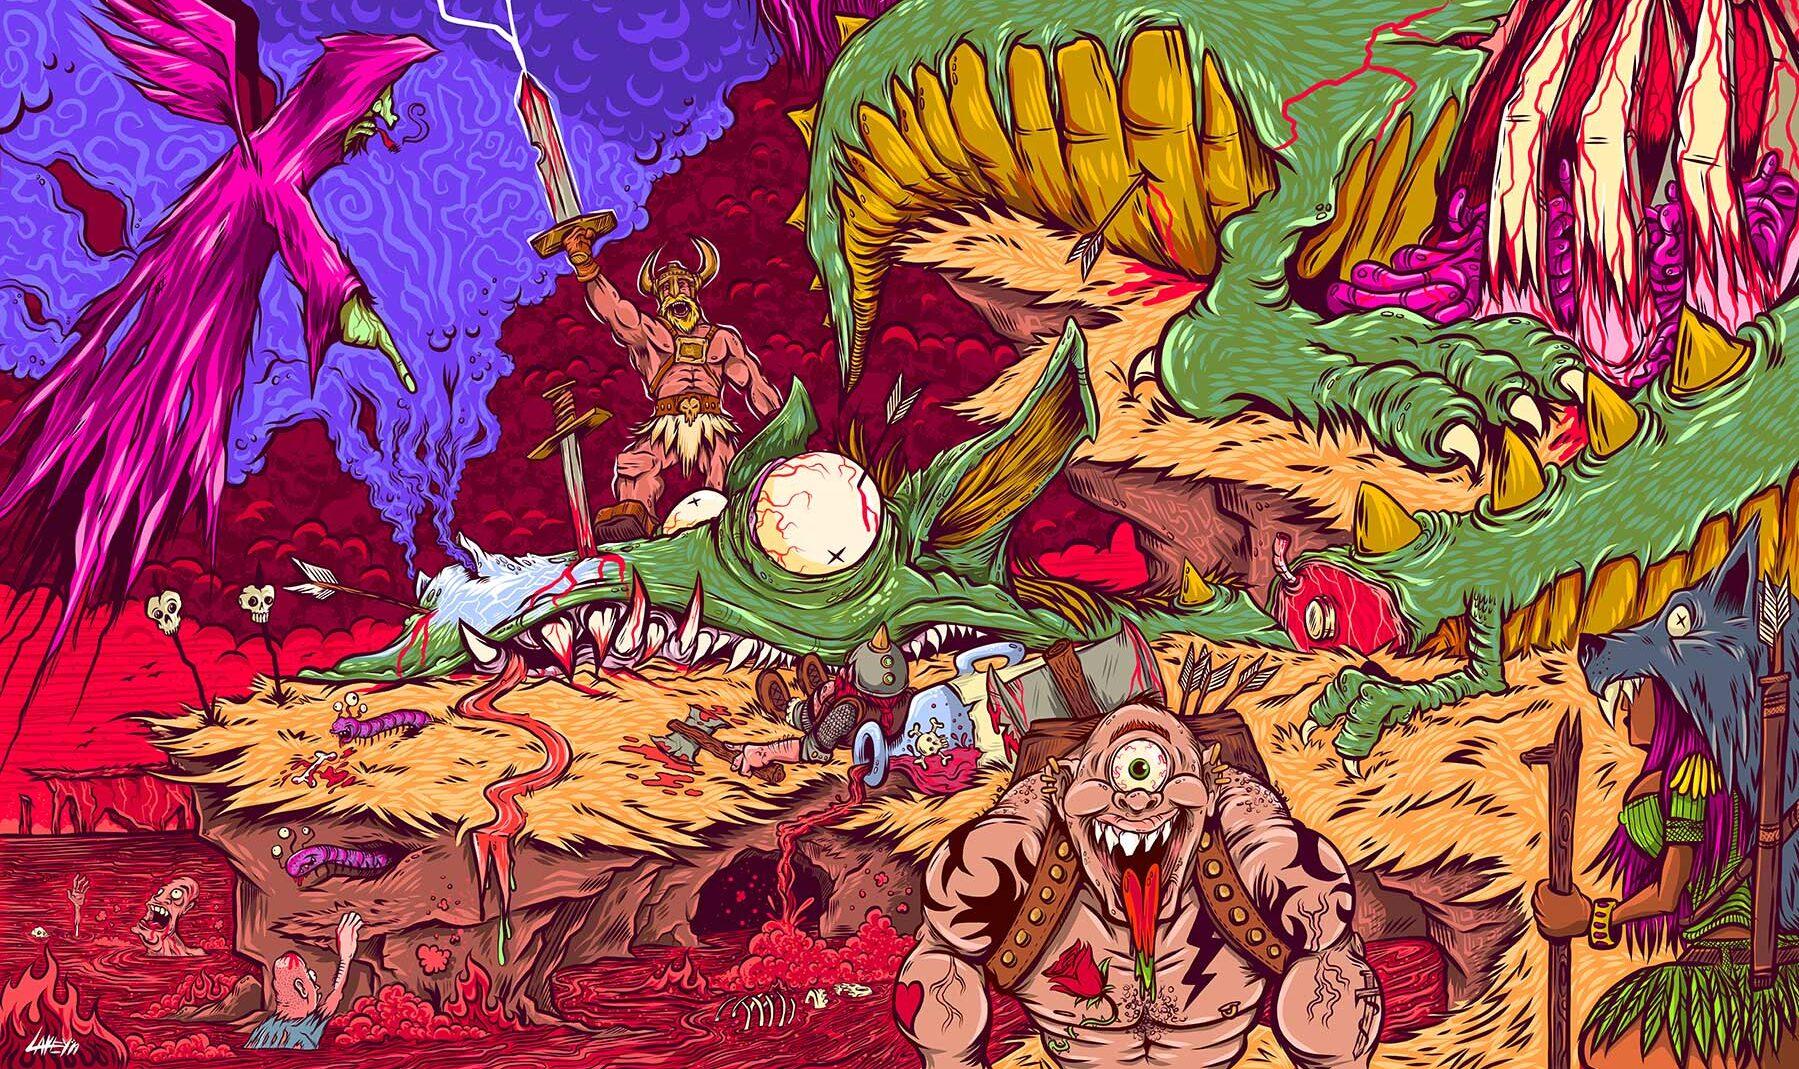 slay the dragon illustration